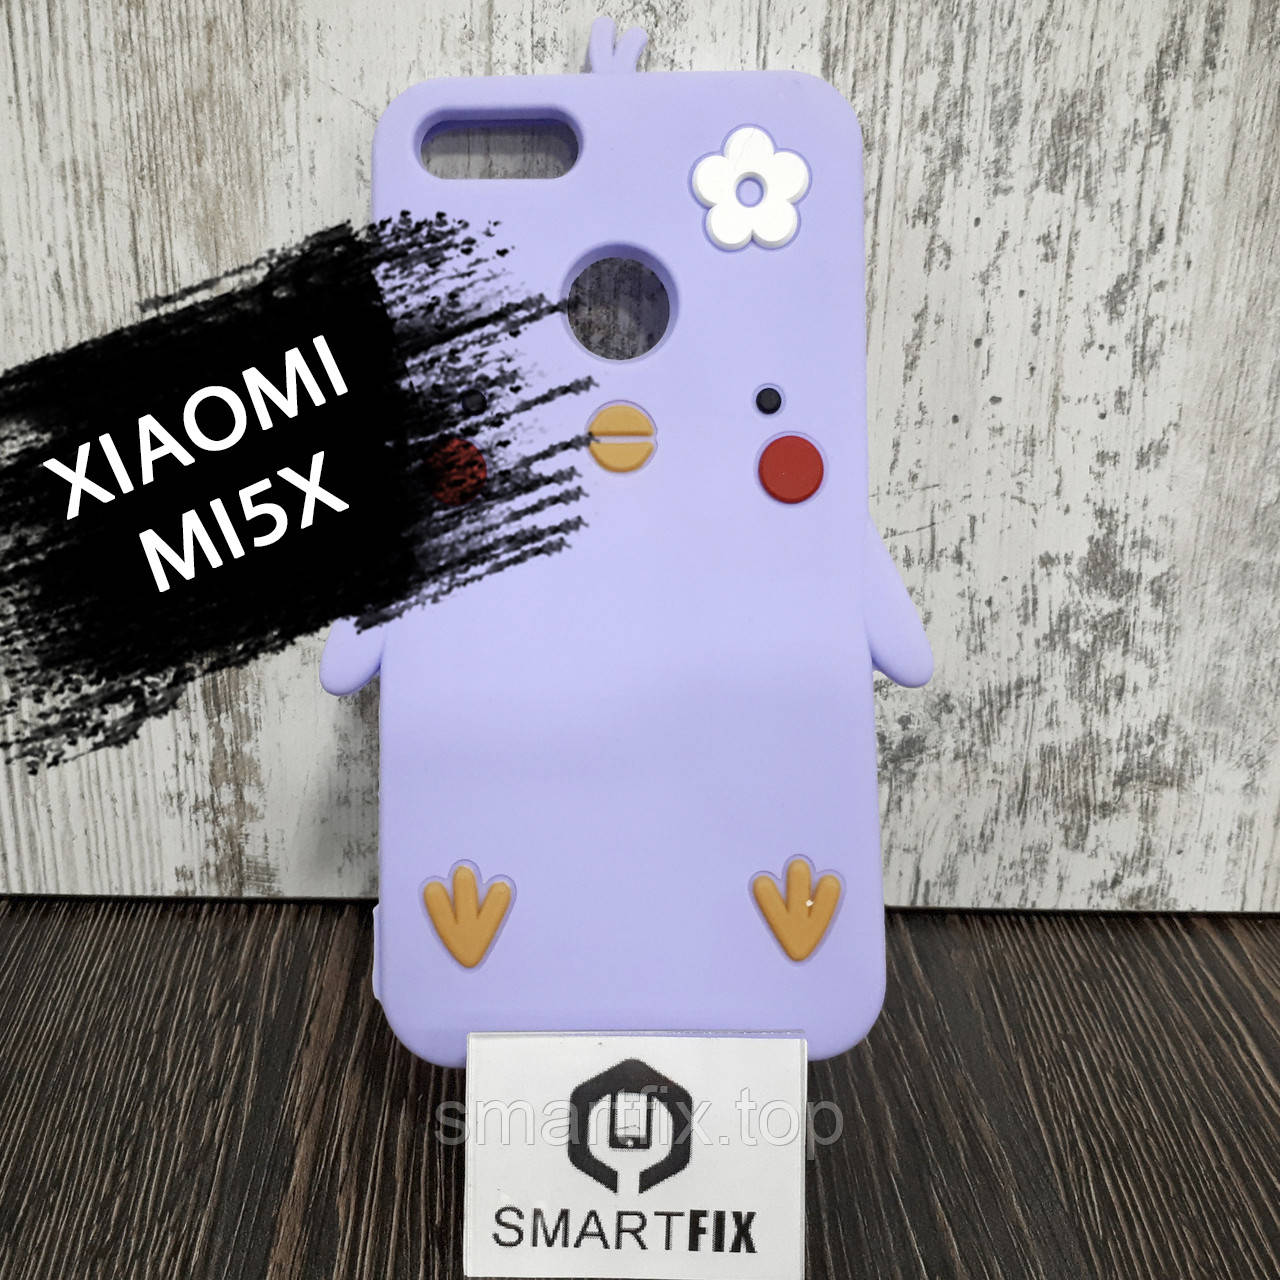 Чехол с рисунком для Xiaomi Mi 5X Сиреневый